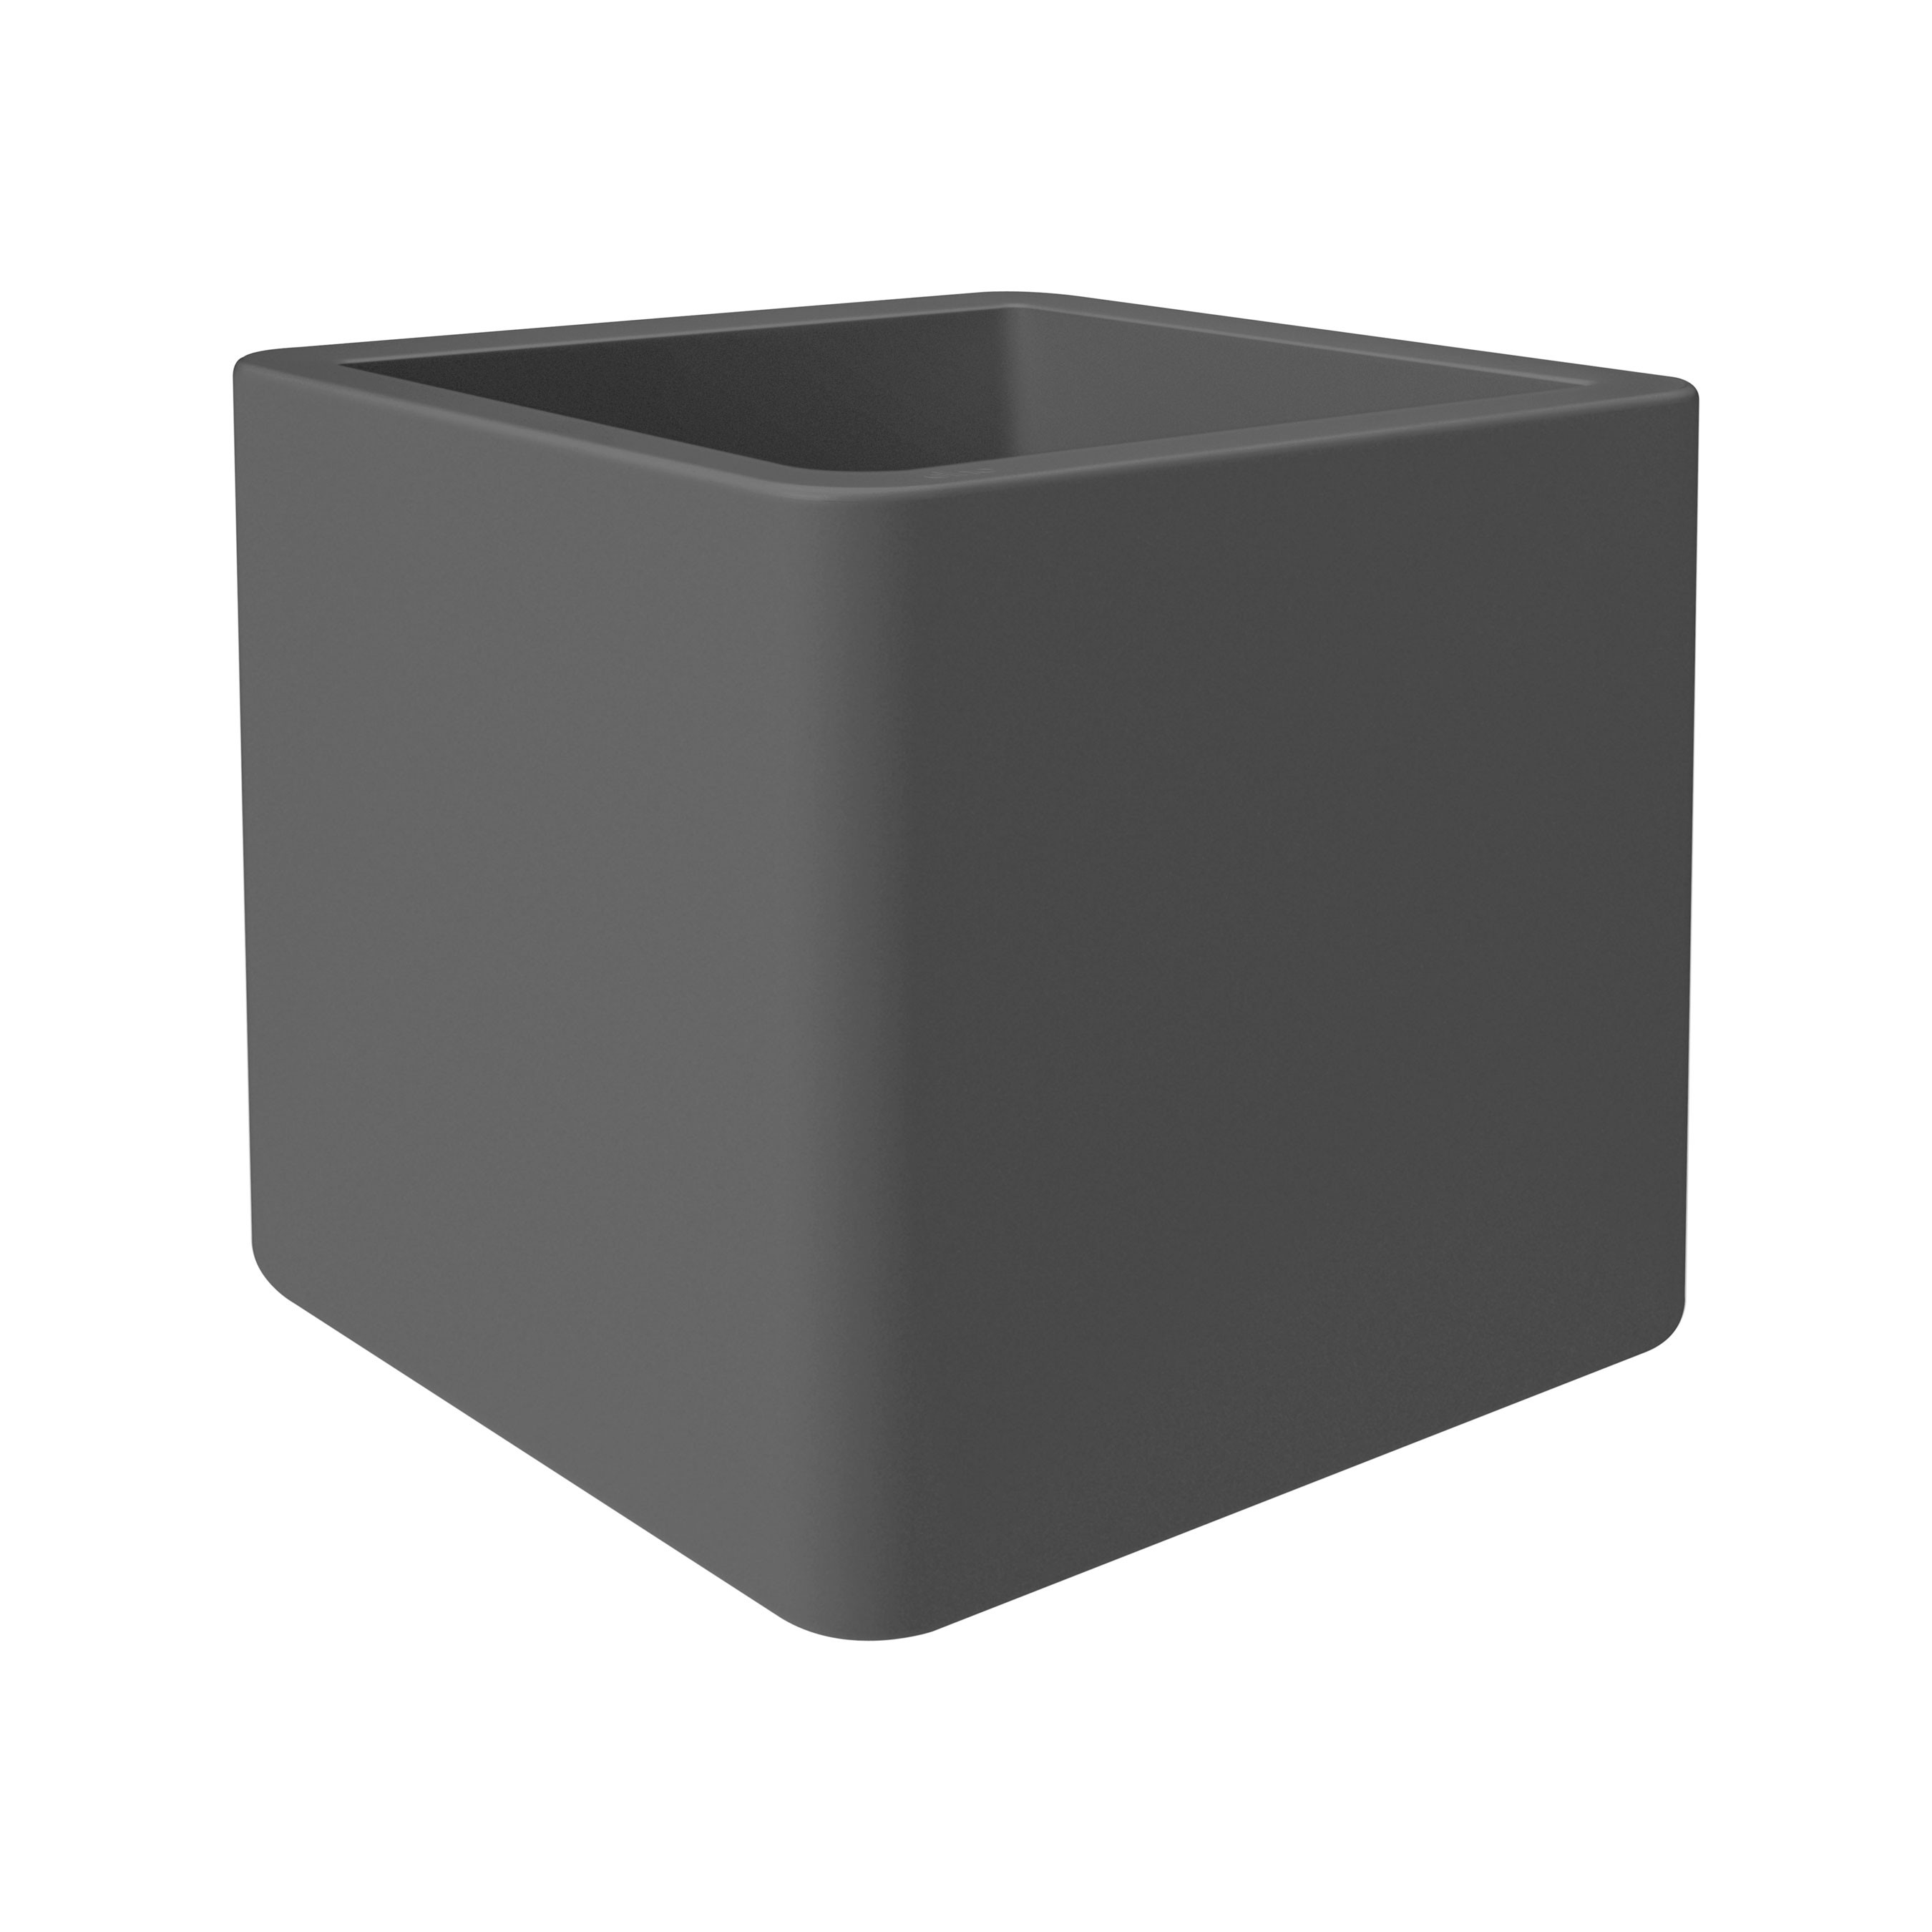 Pflanzgefäß / Pflanzkasten elho Pure Soft Brick 50x50x49cm anthrazit Bild 1